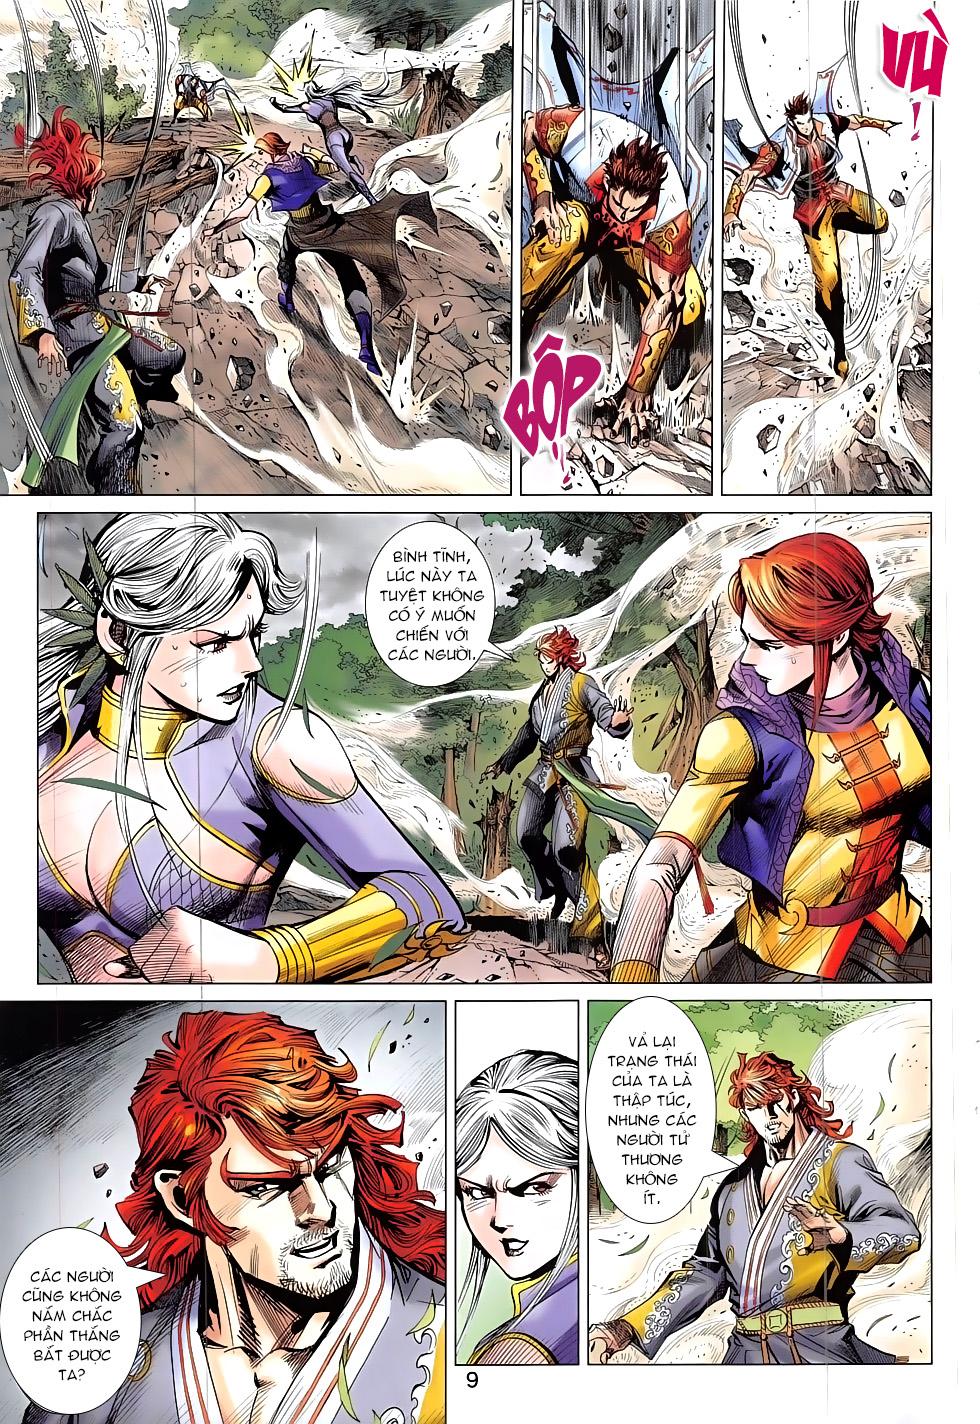 Thần Chưởng chap 24 – End Trang 9 - Mangak.info